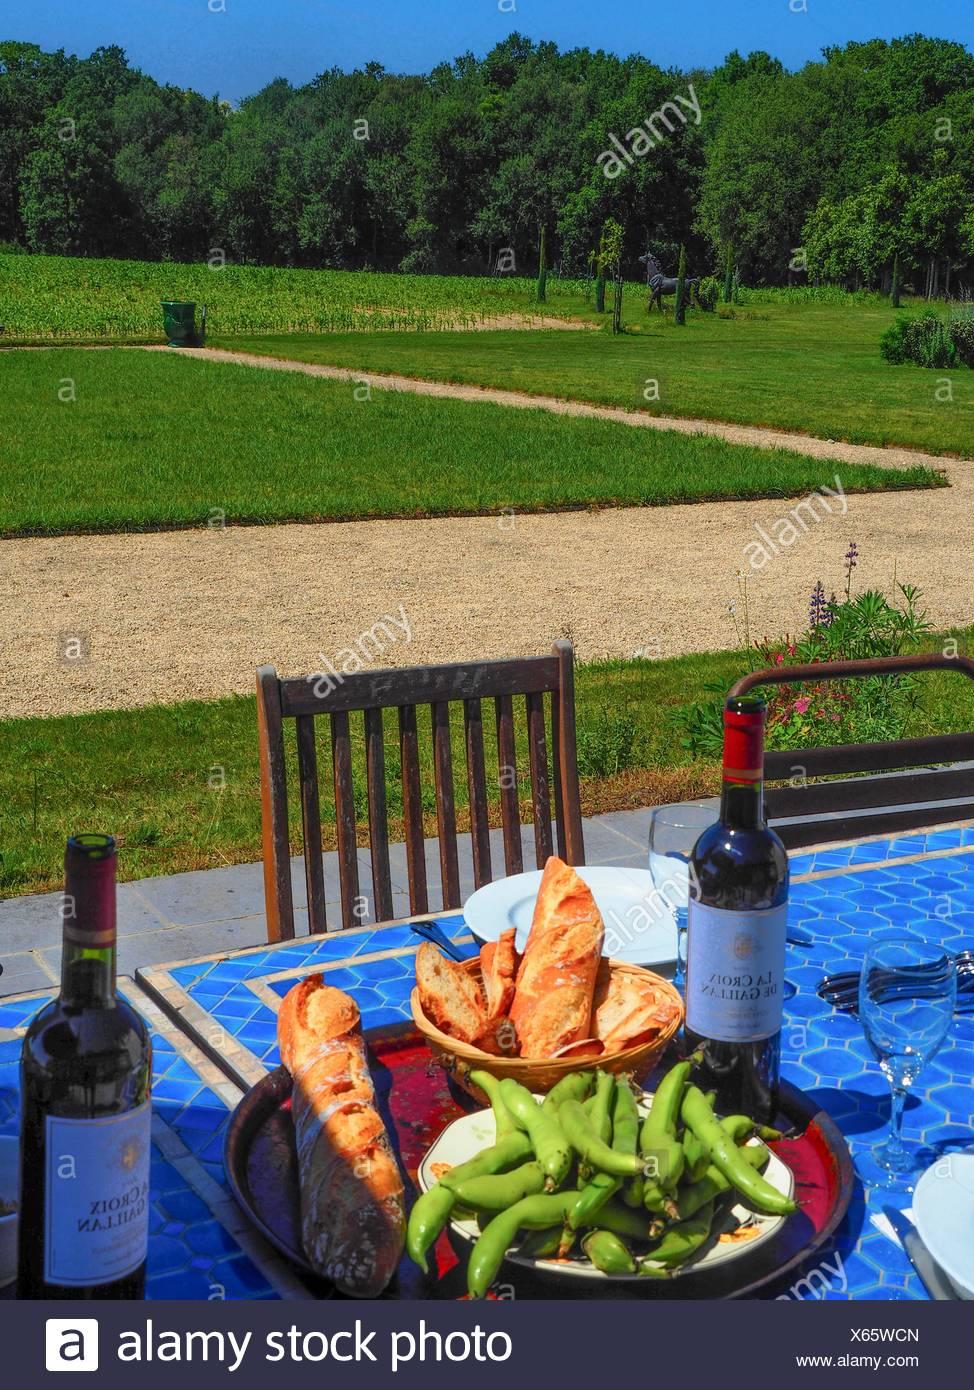 Almuerzo en las Cultures de Puygareau guestouse encantador, Sossay, Vienne, Poitou-Charentes, Francia Imagen De Stock